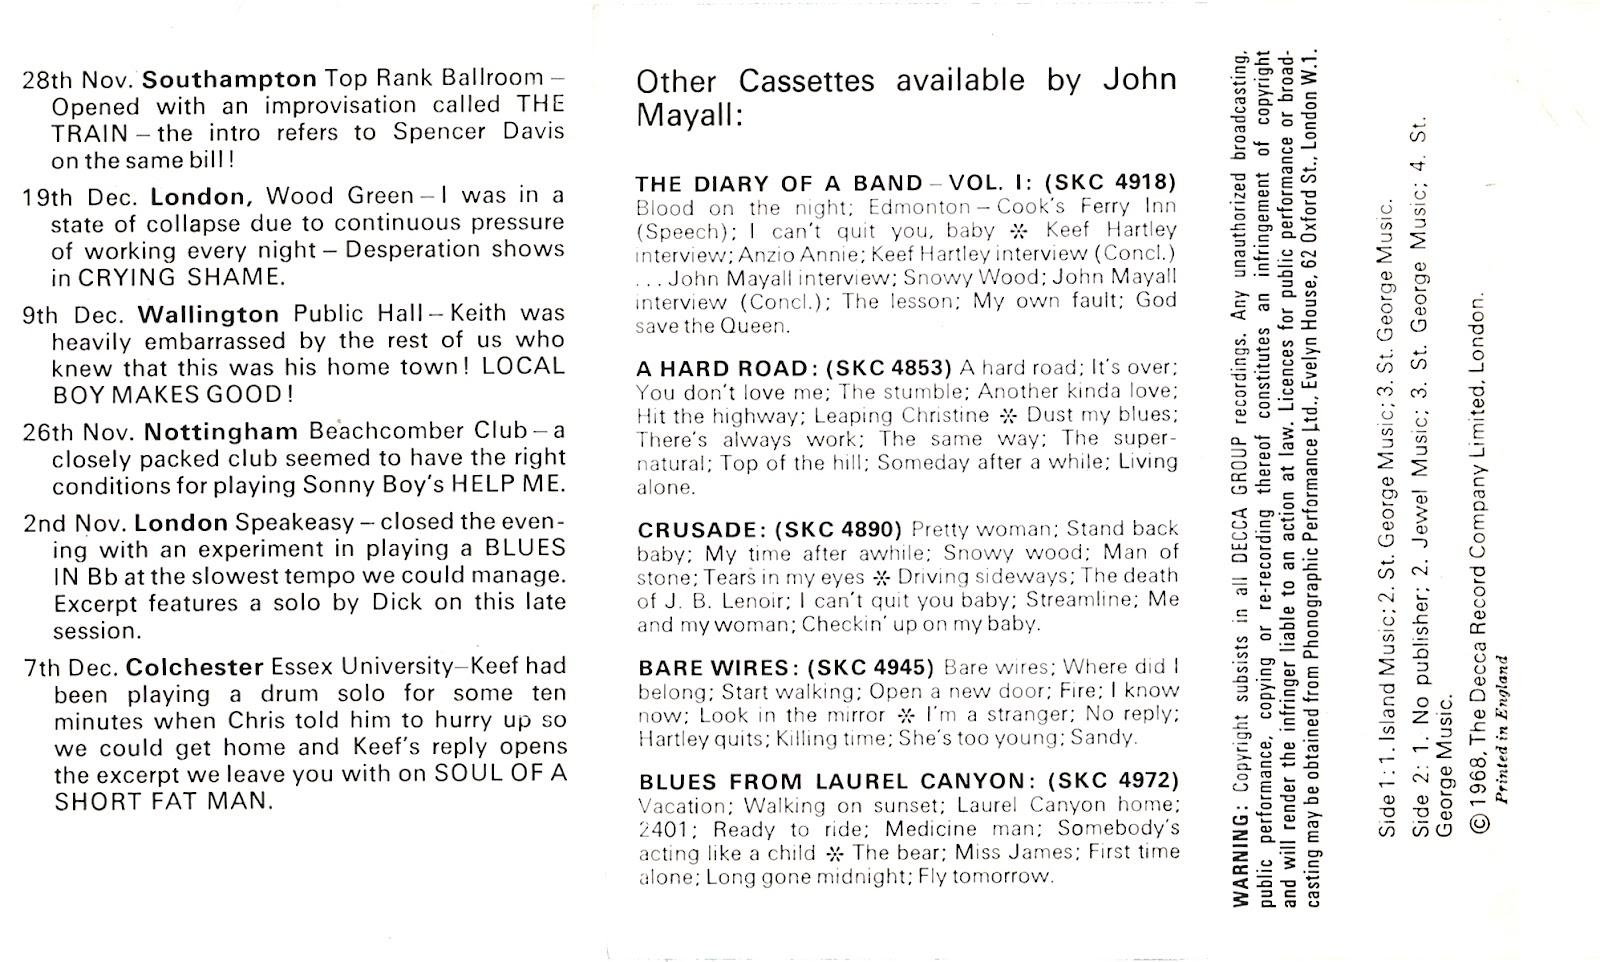 Cassette Cover Art Library: John Mayall & the Bluesbreakers